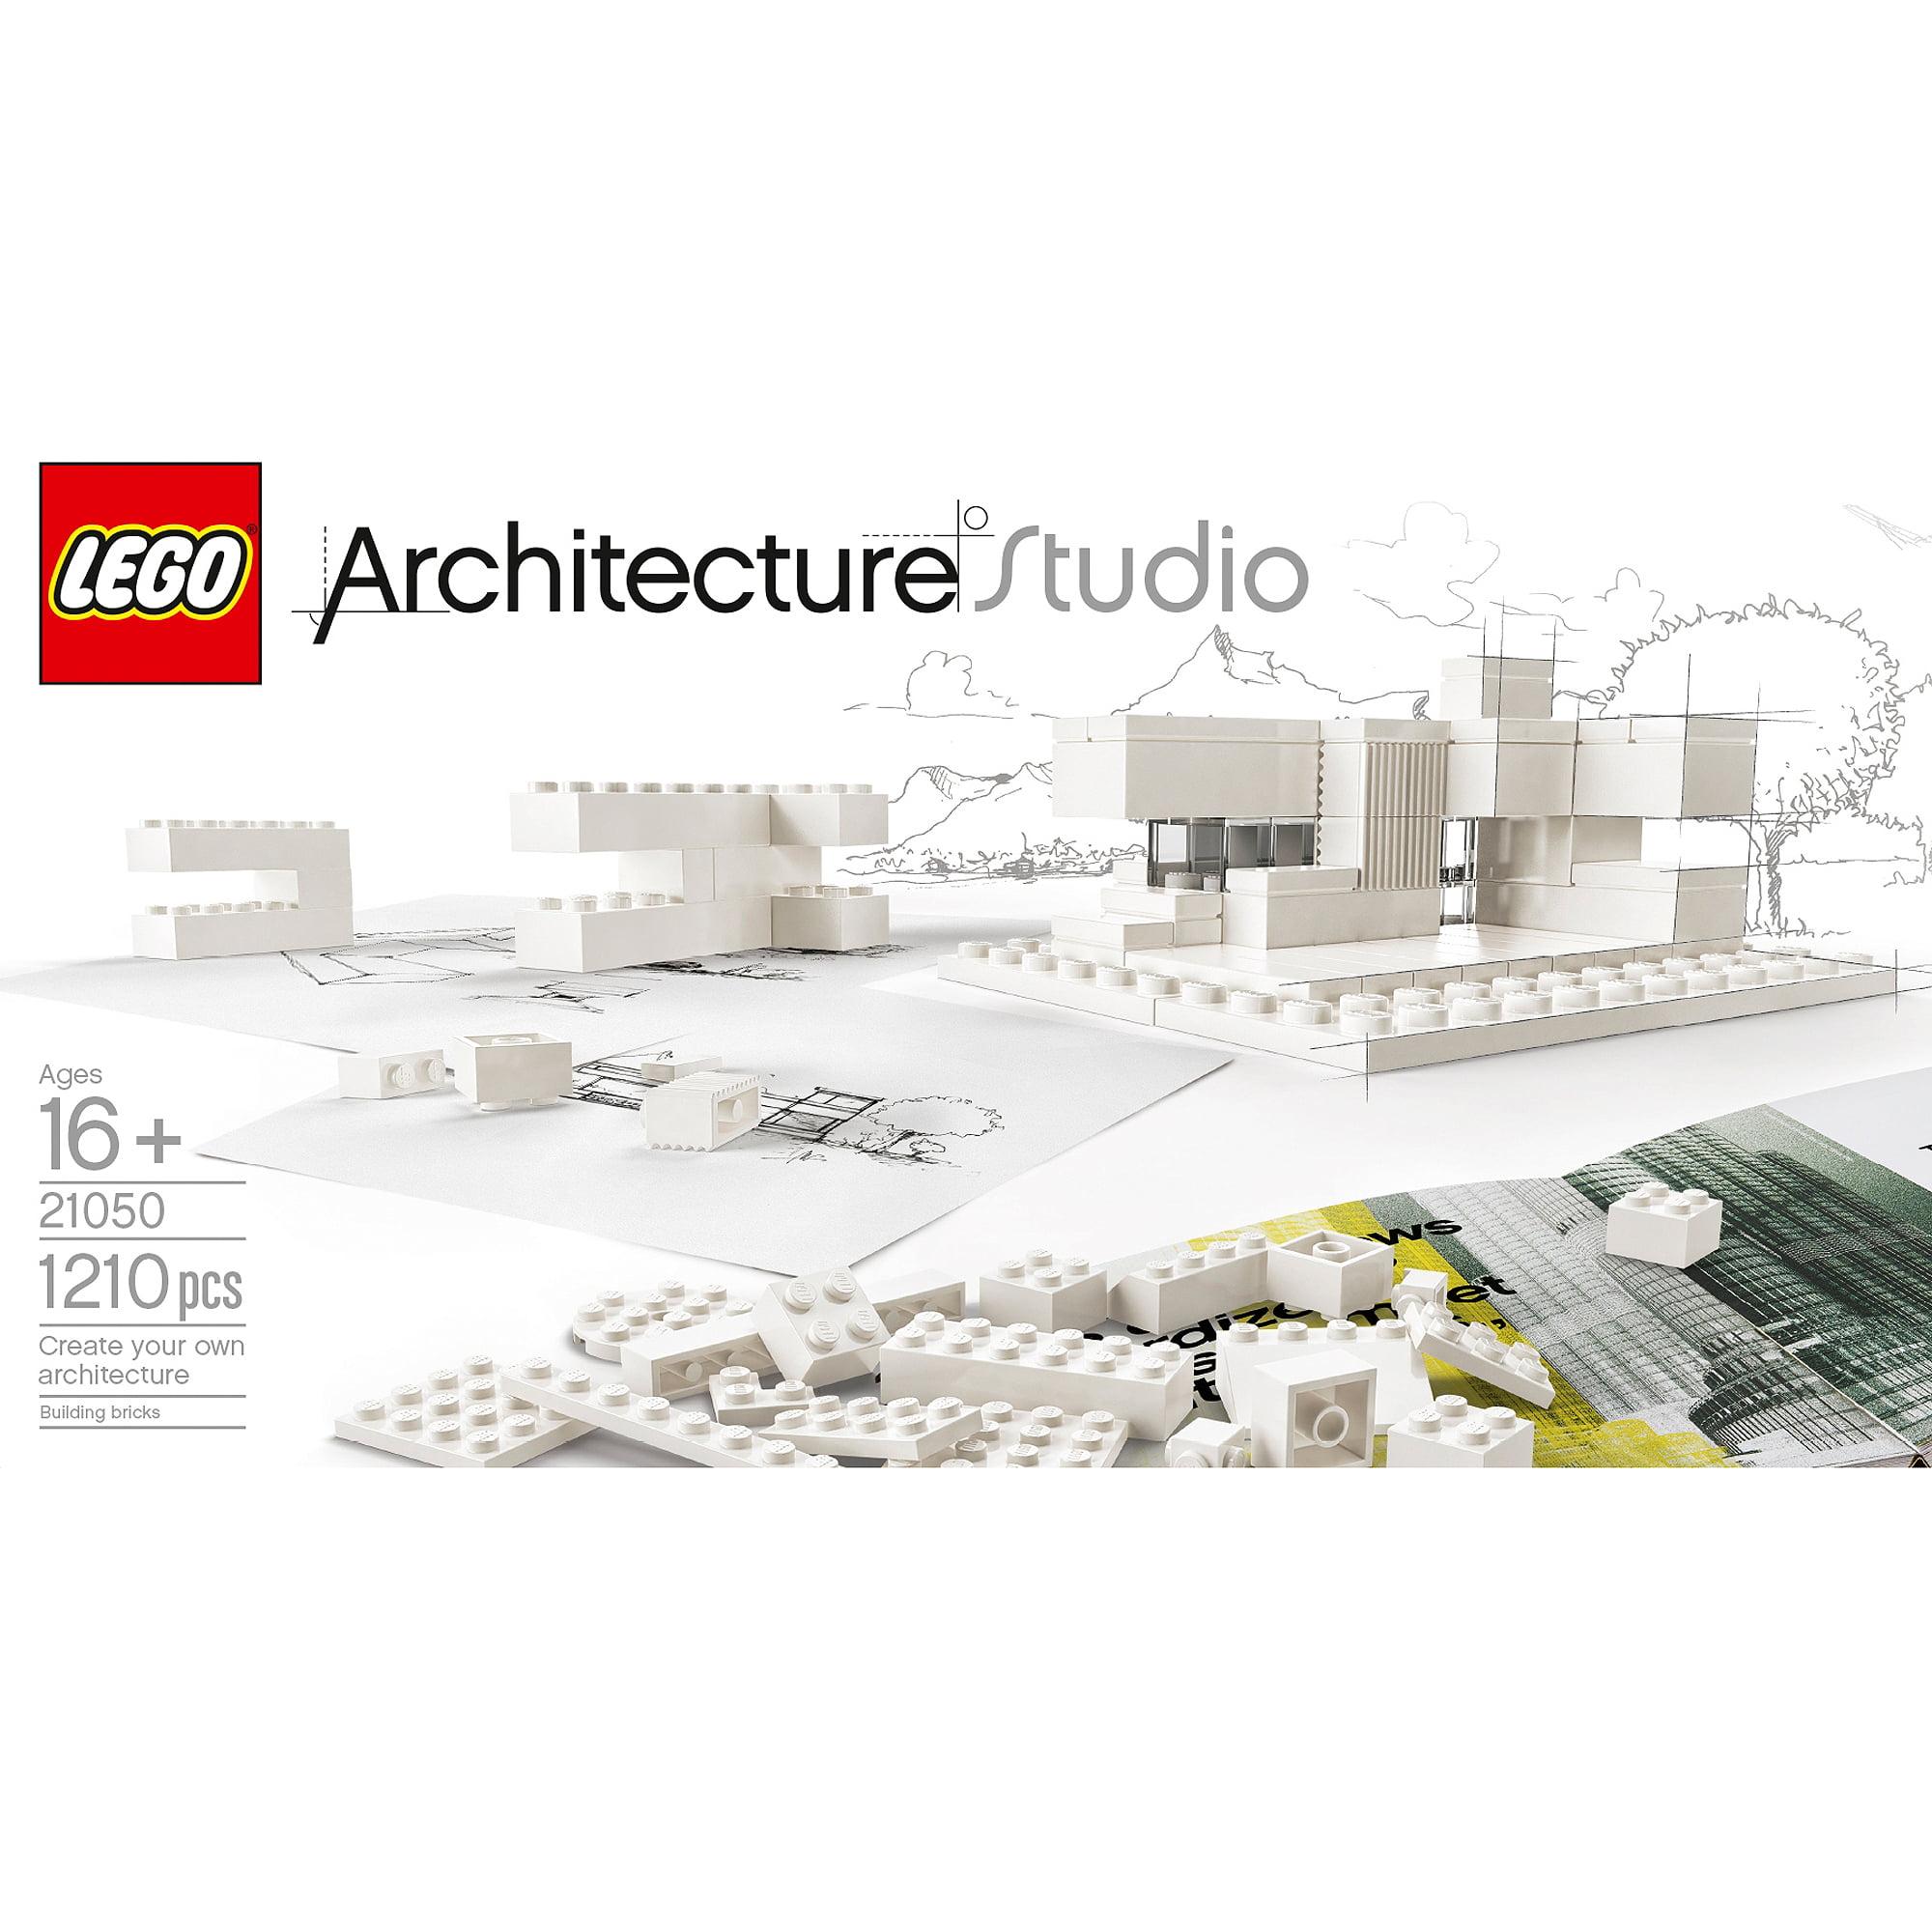 Architecture Studio Lego lego architecture studio - walmart